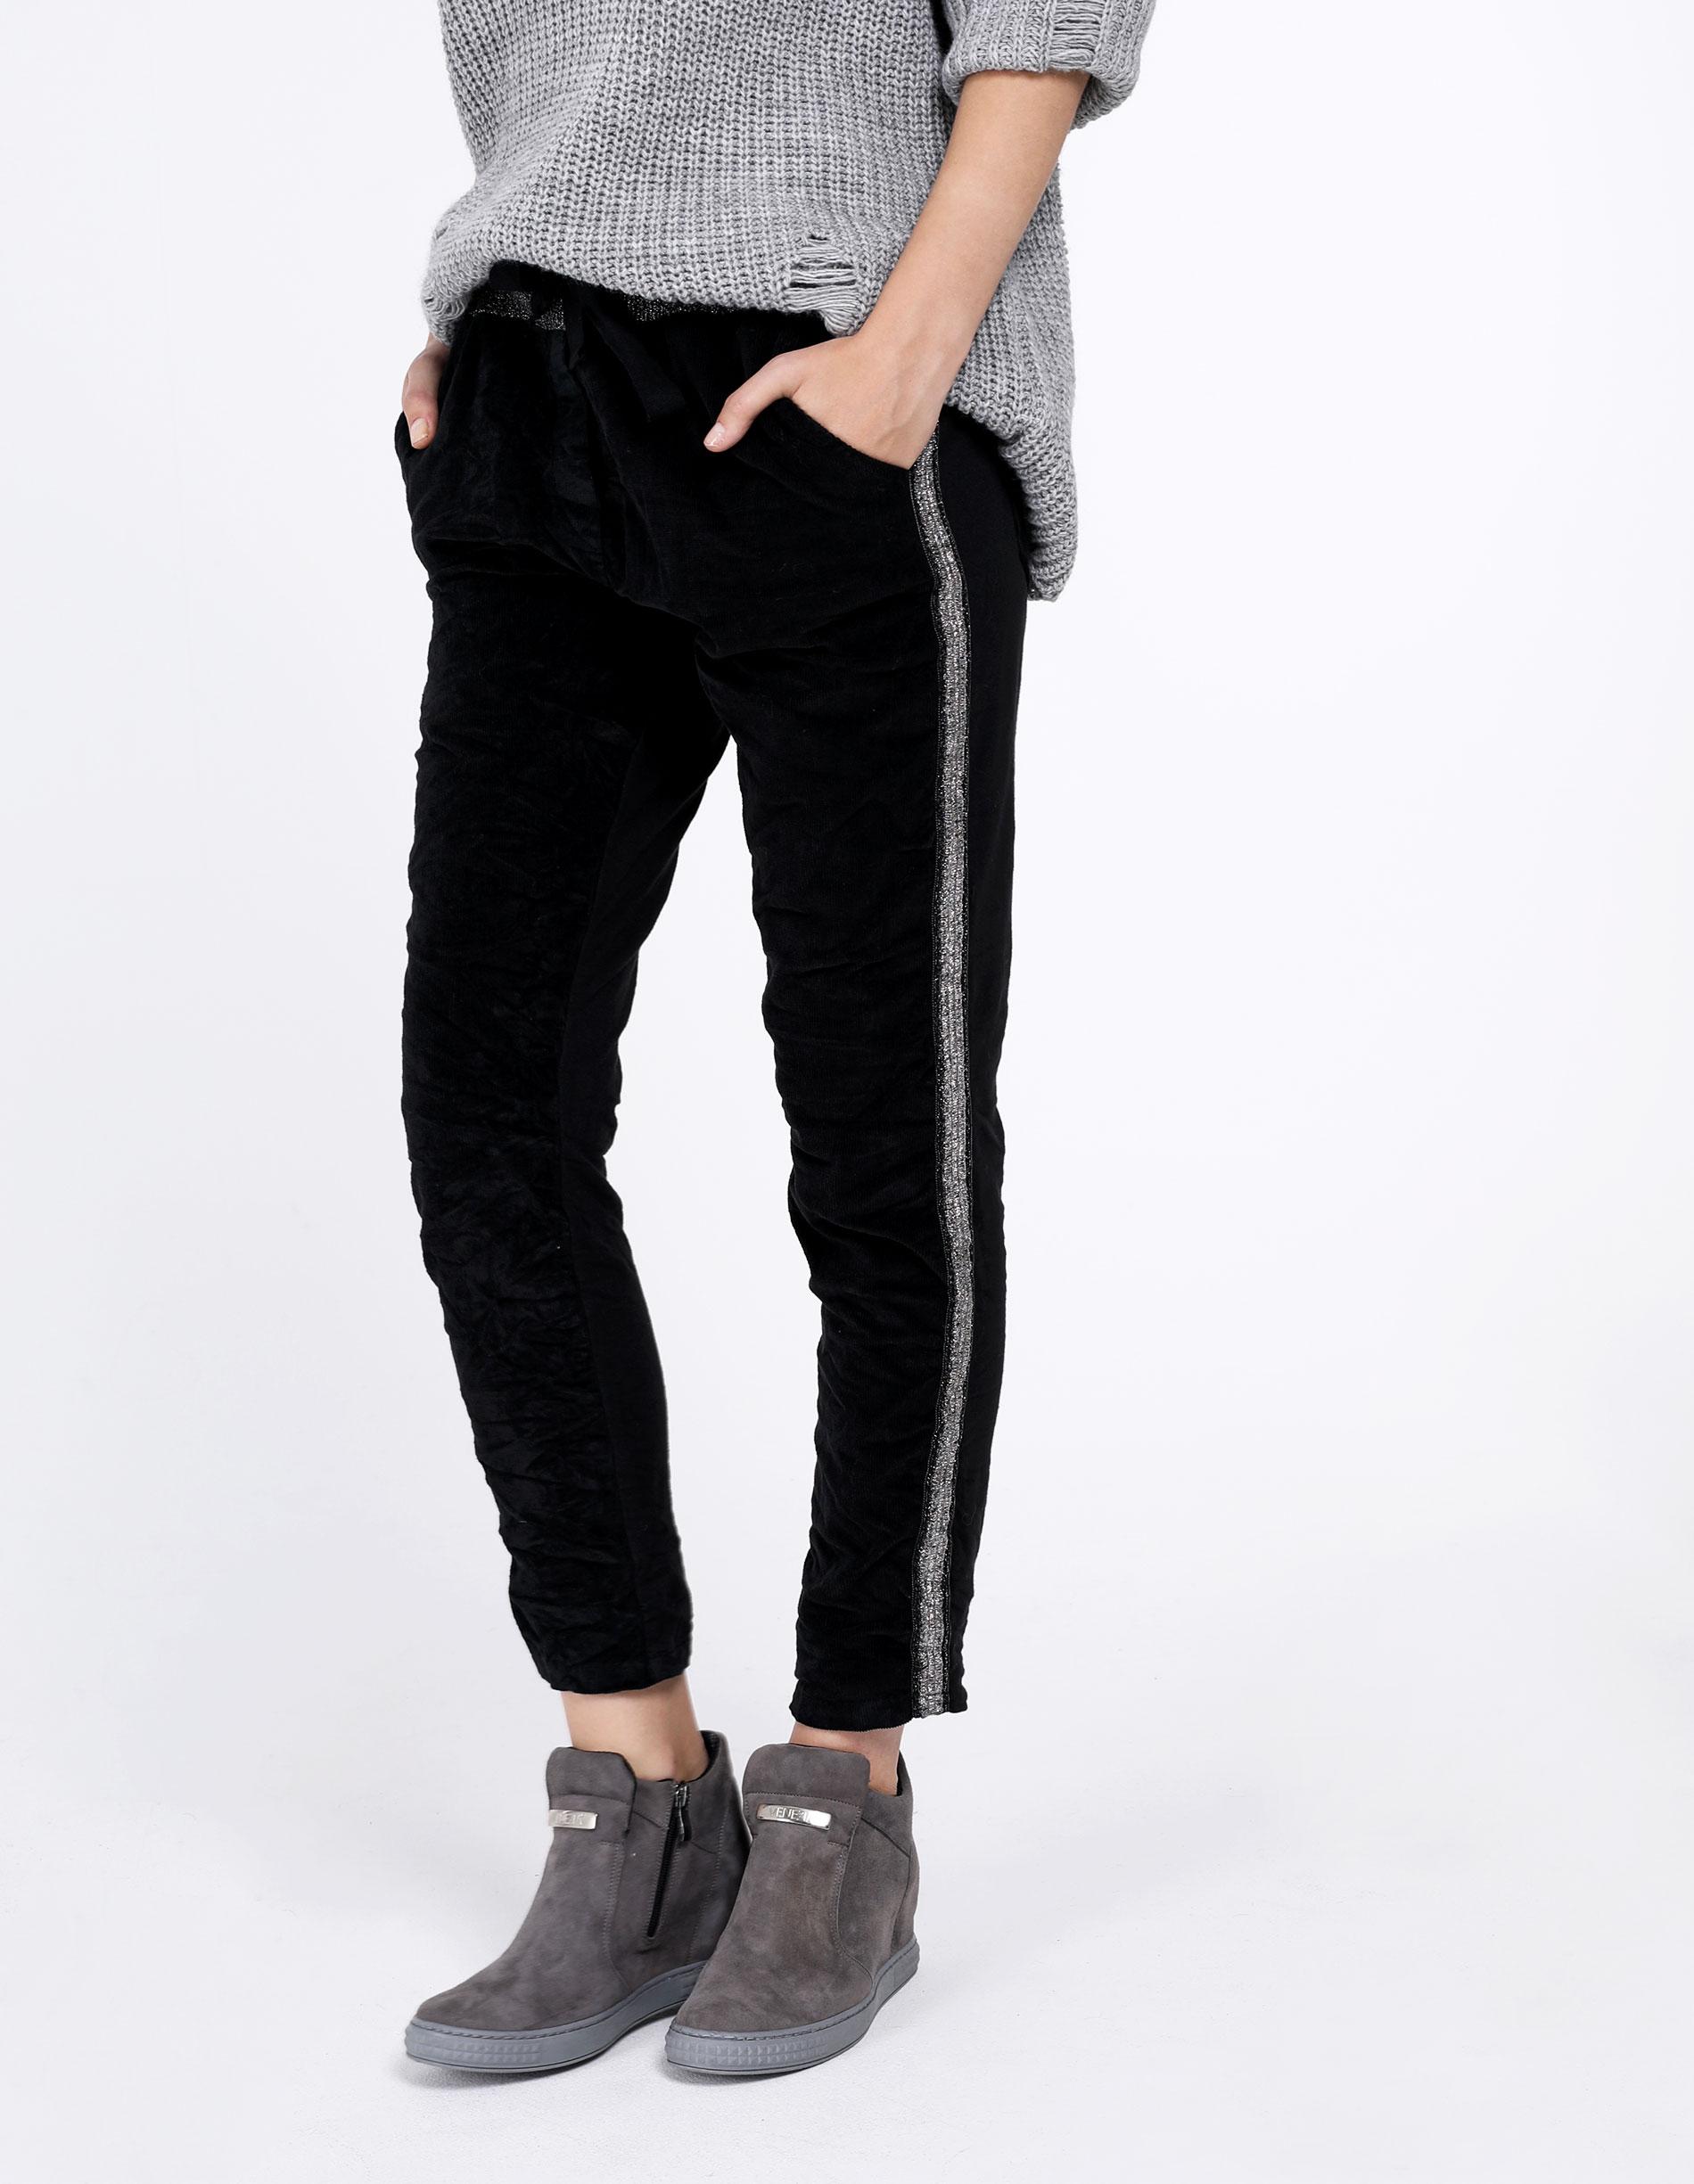 Spodnie - 164-6075 NERO - Unisono